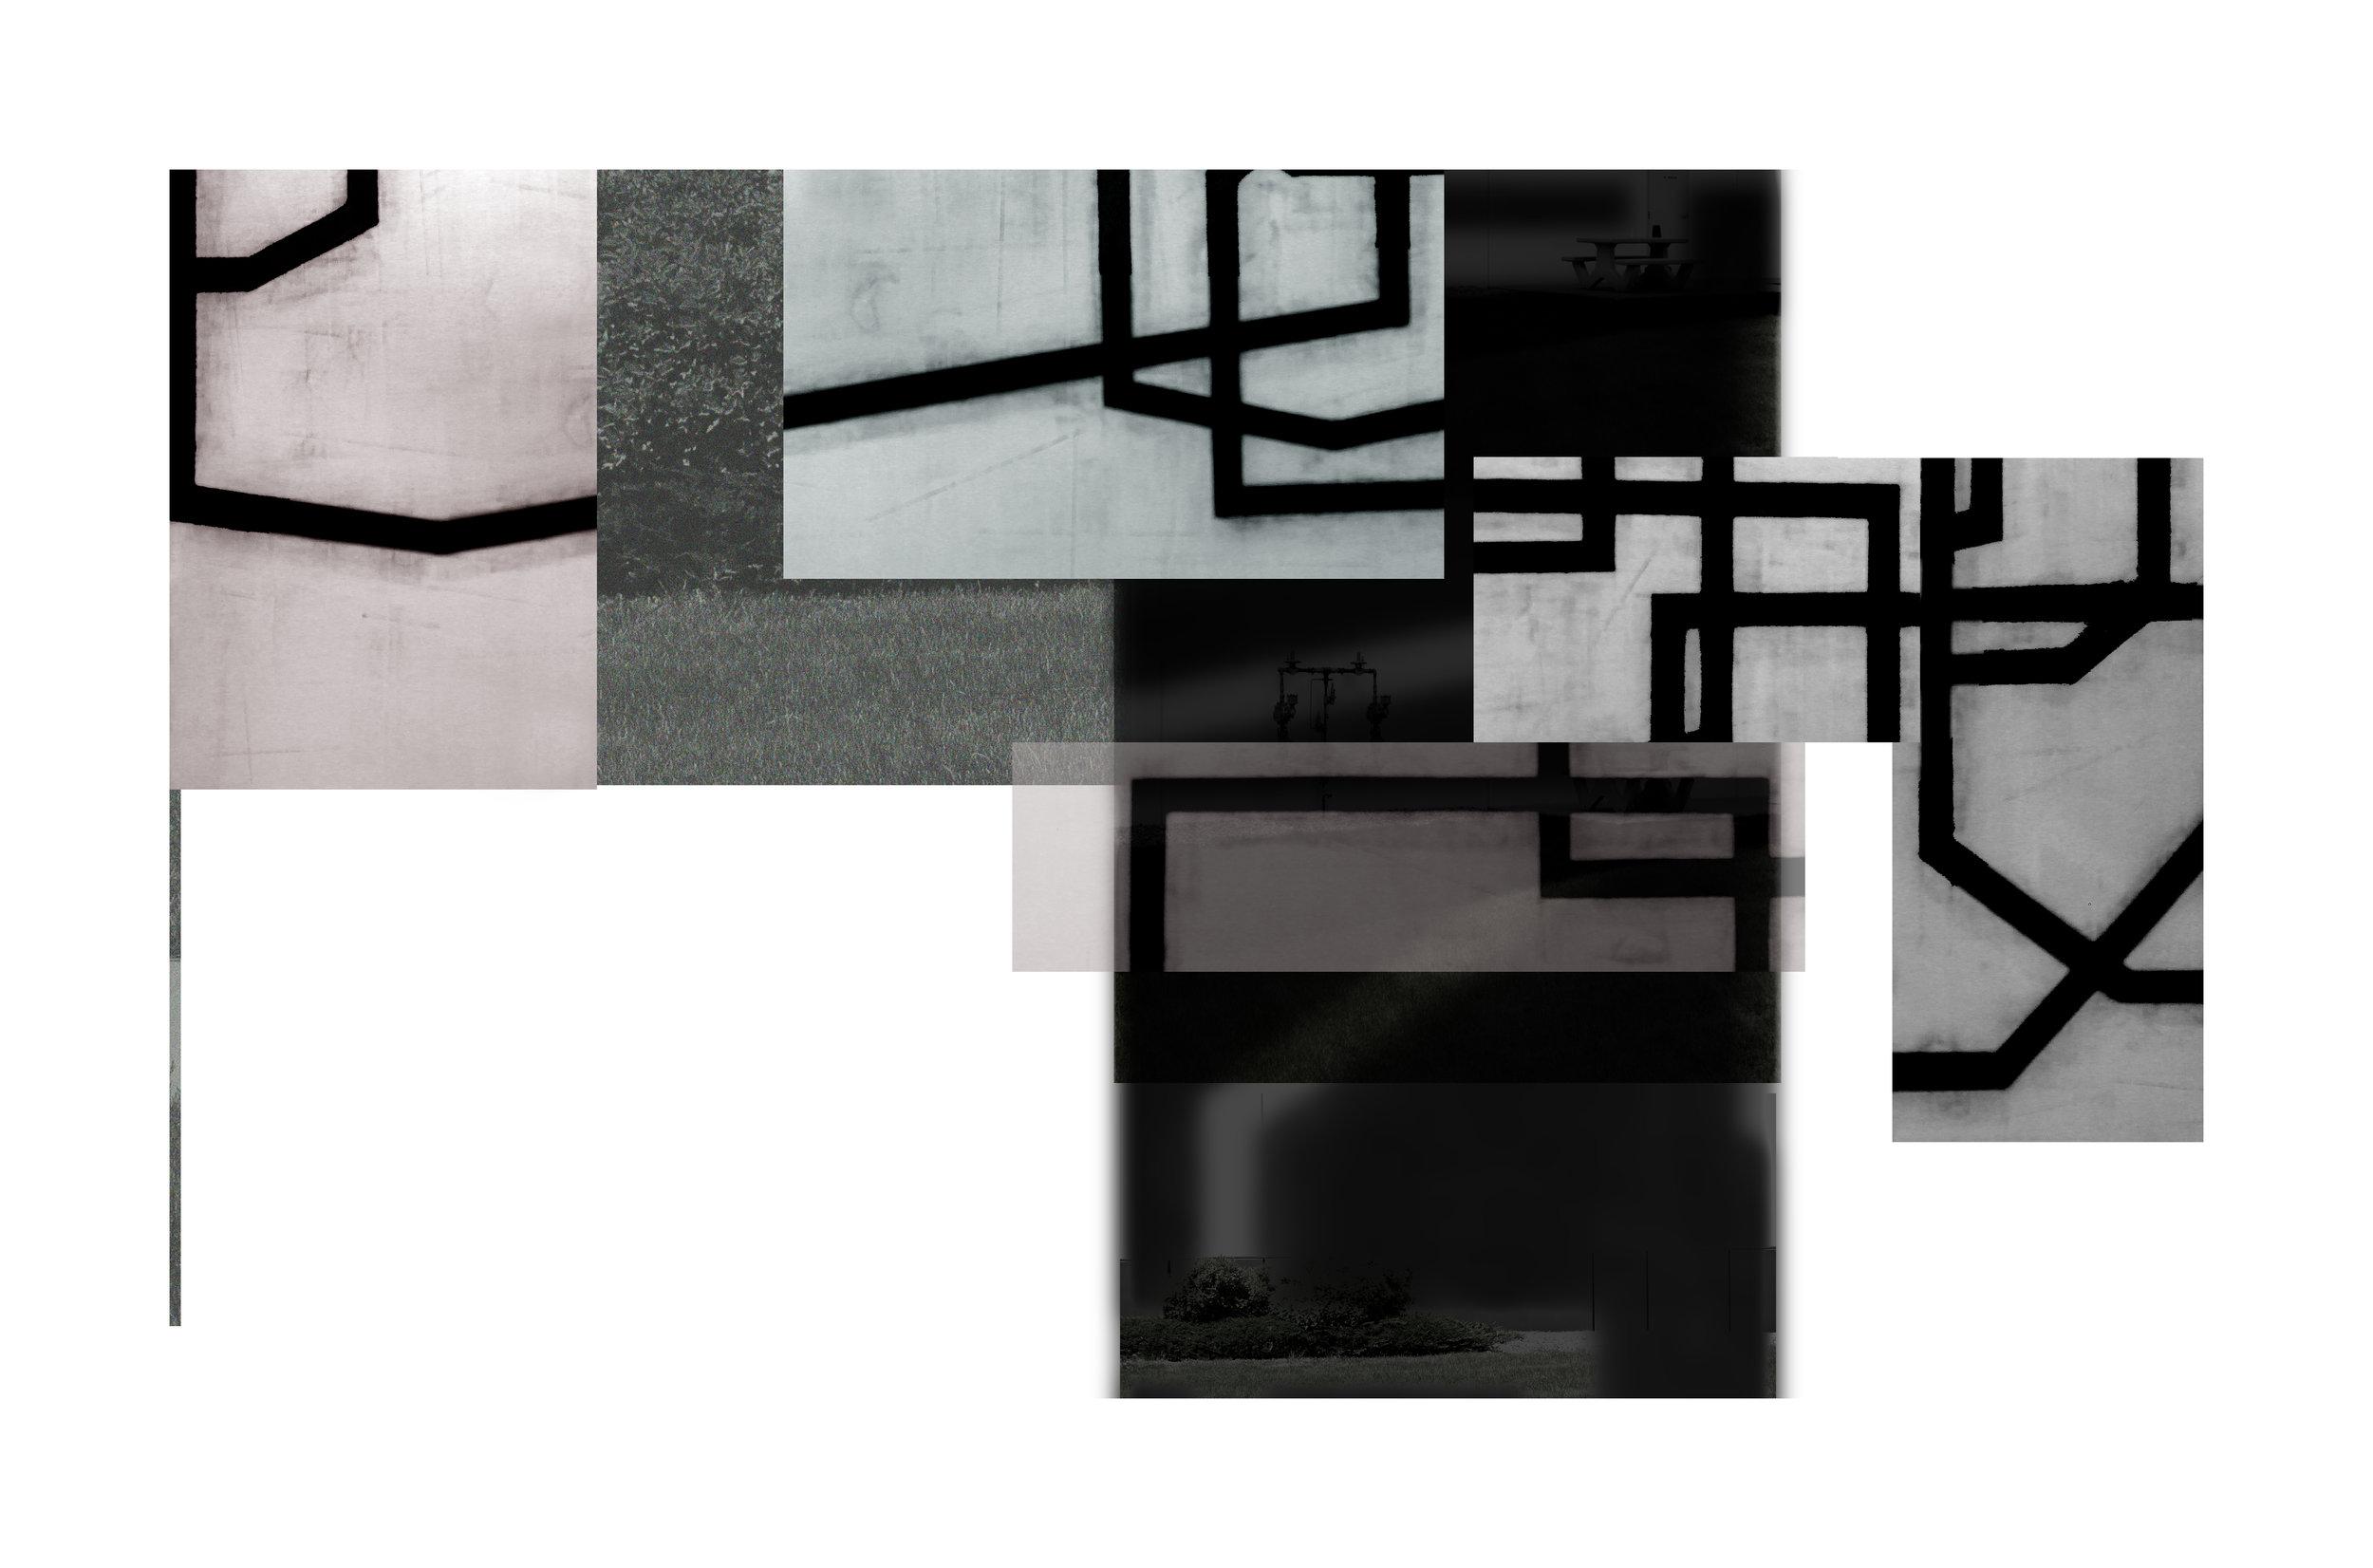 Exurban Archipelago P3 | 2018 | archival pigment print | 14.5 x 24 inches